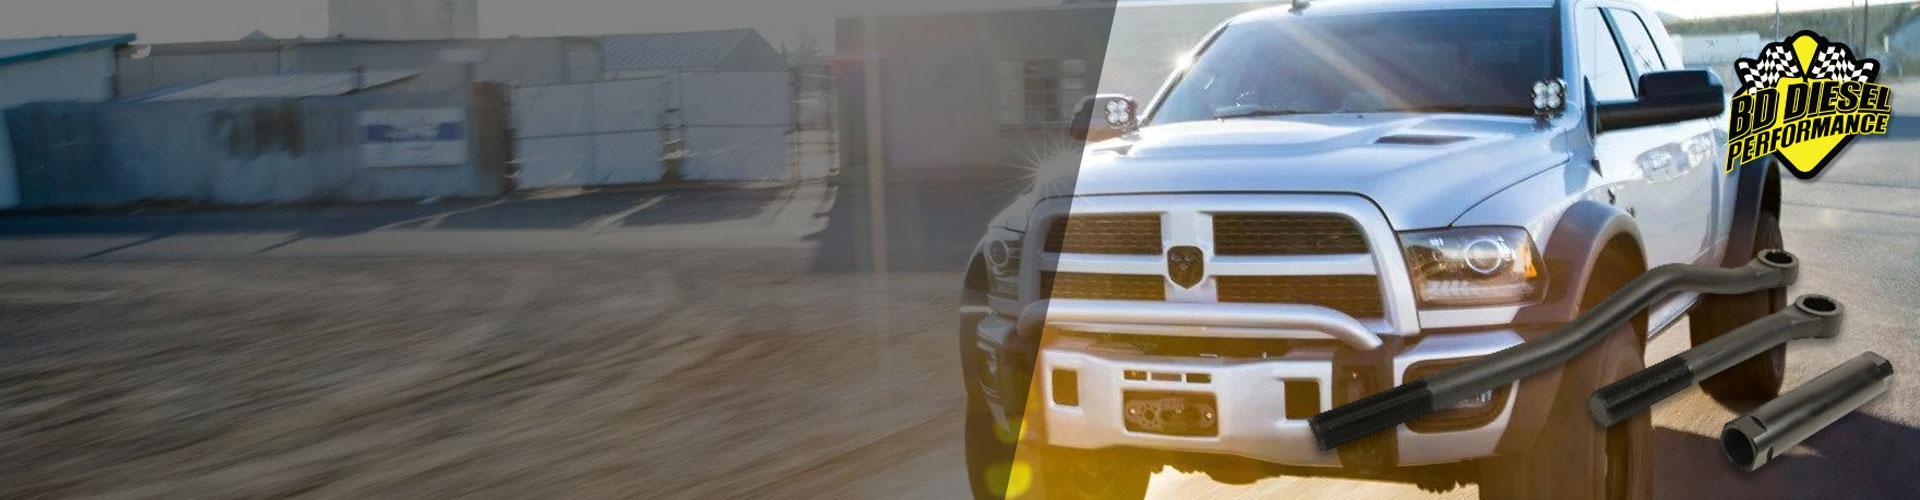 Diesel Performance Parts - Cummins, Powerstroke, Duramax